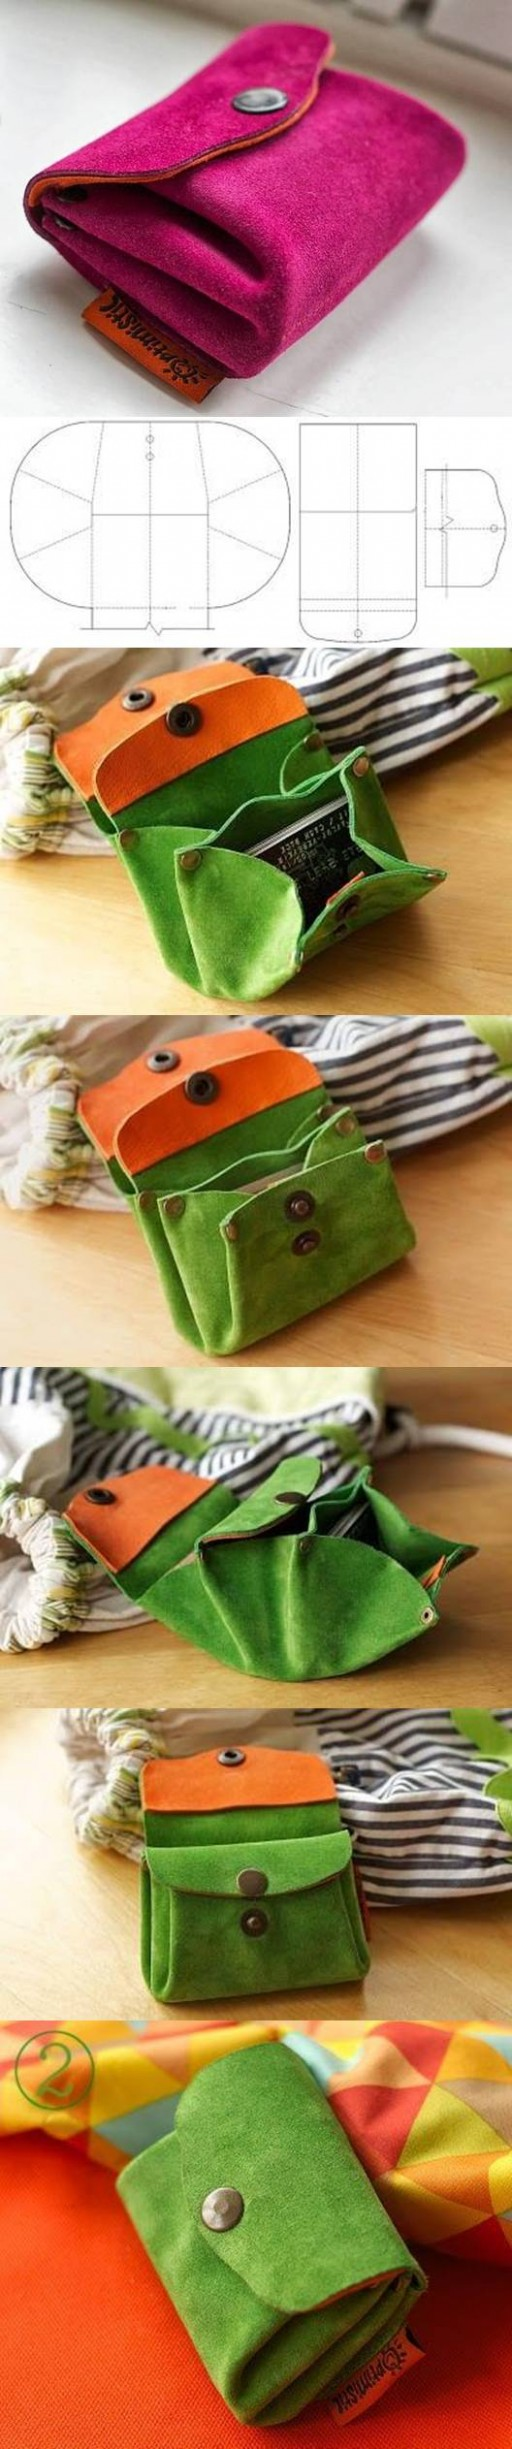 felt mini purse tutorial